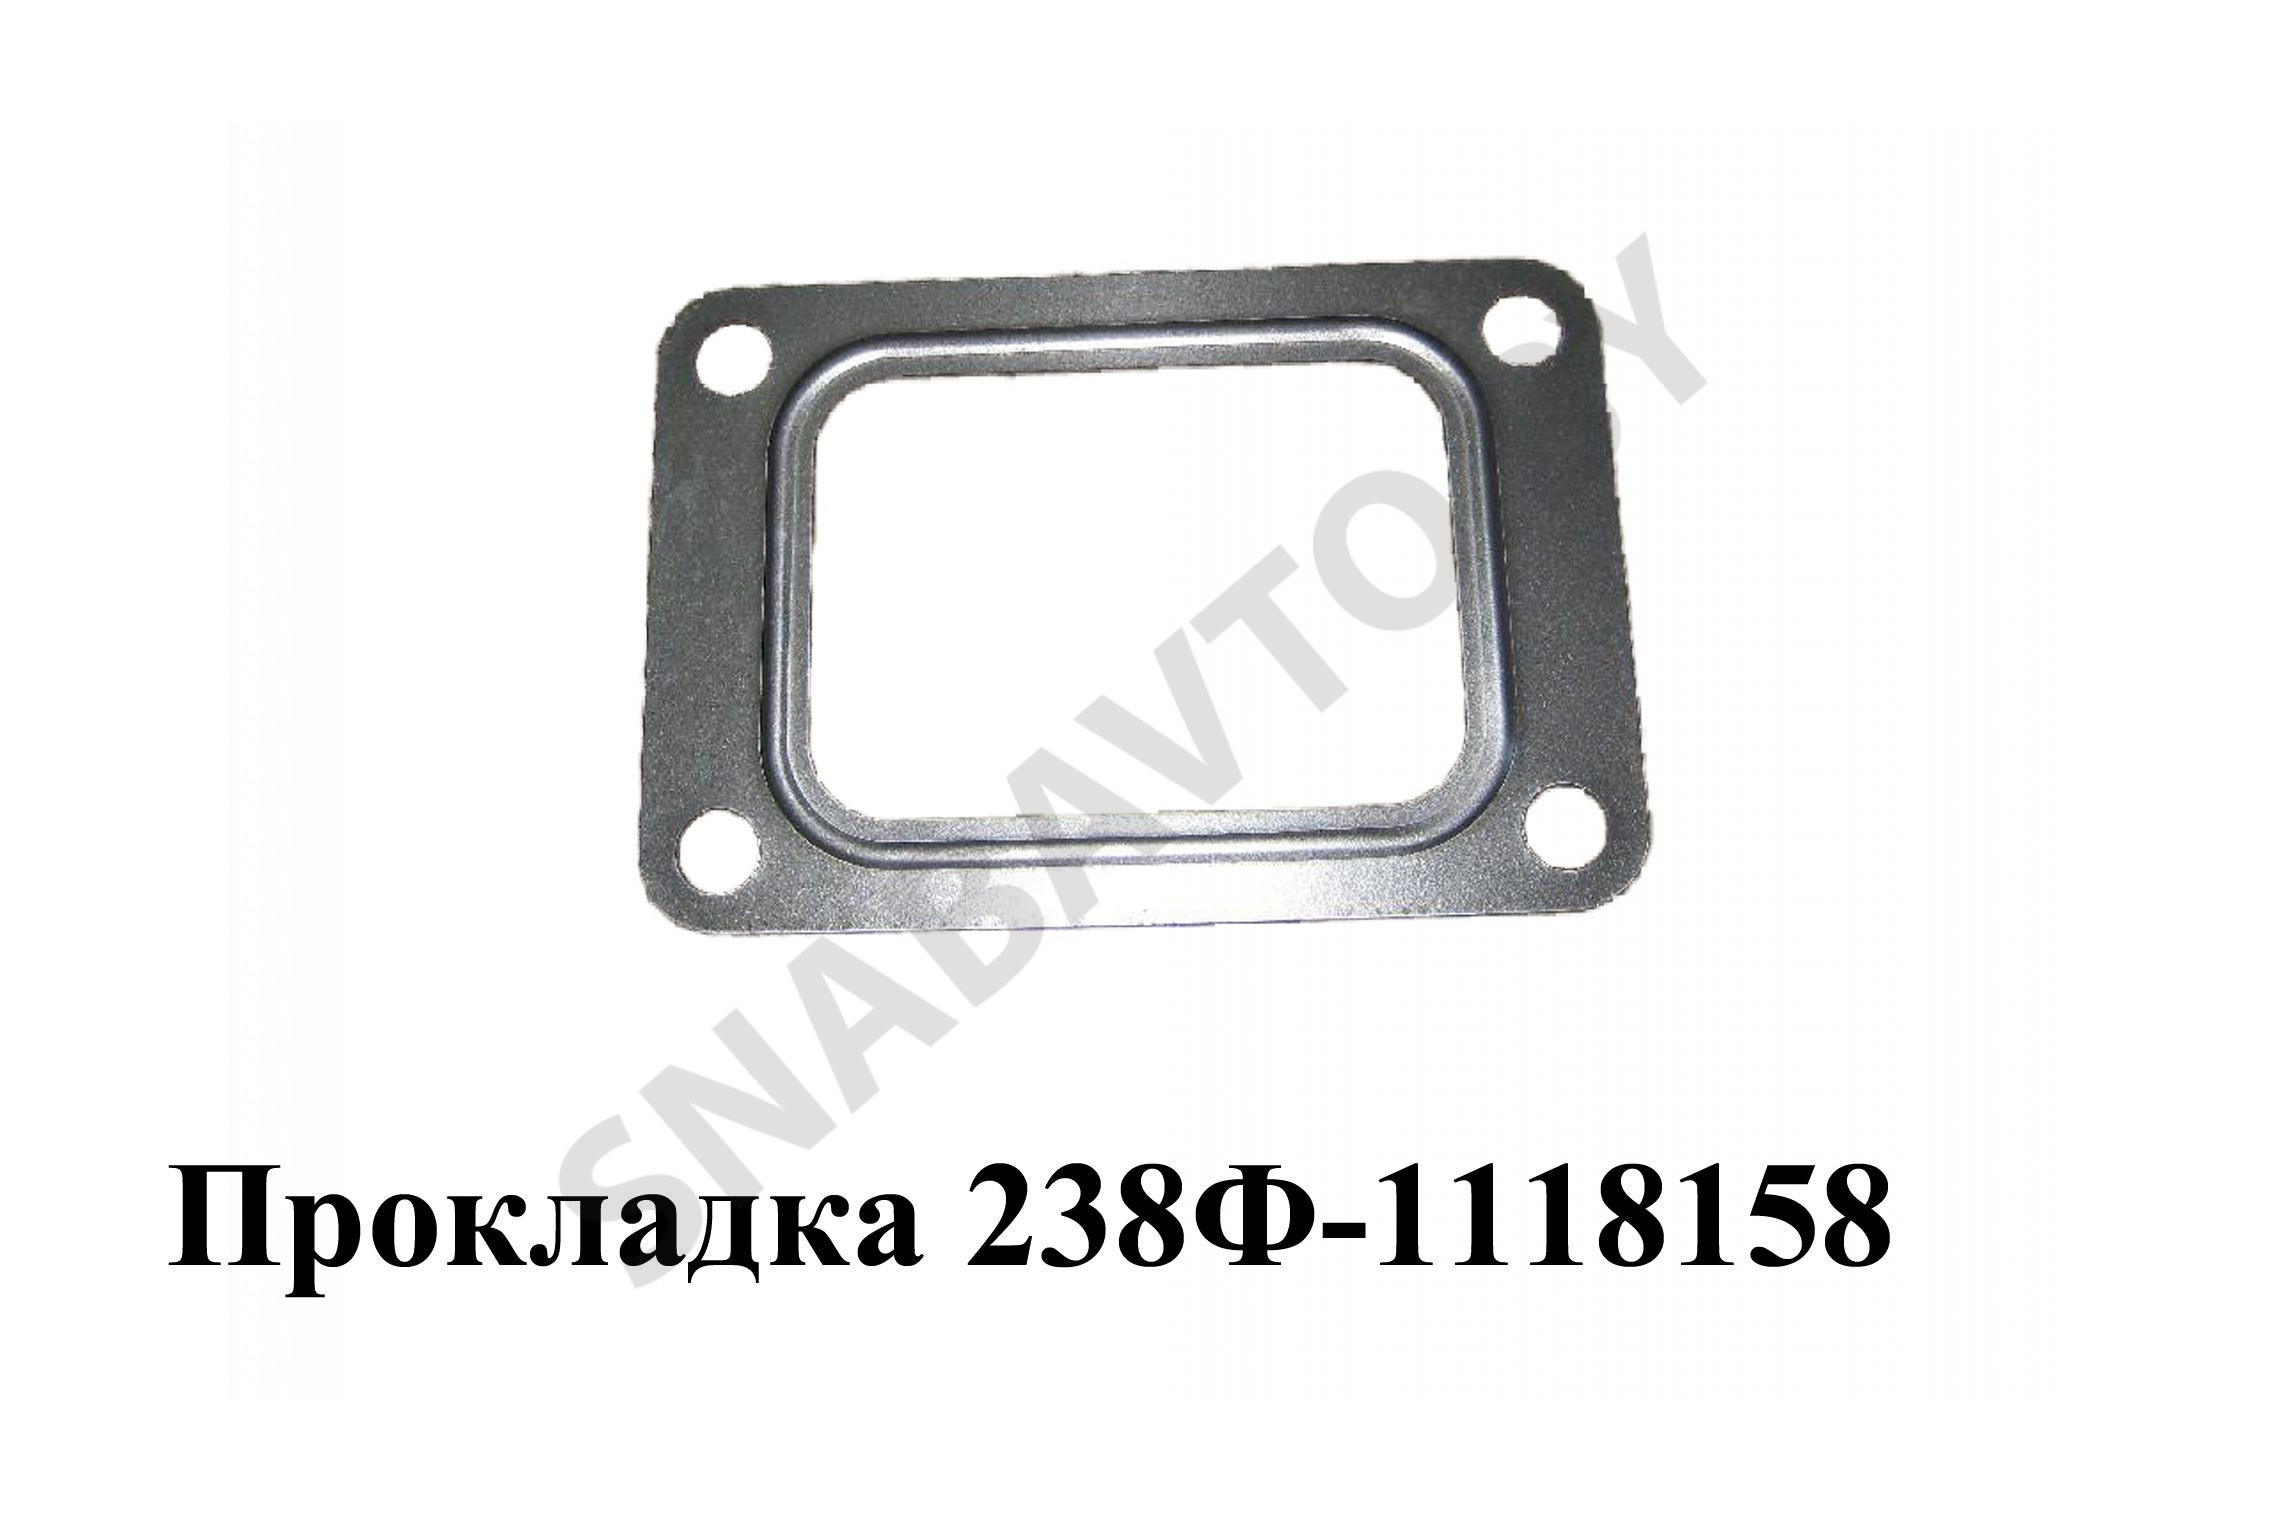 238Ф-1118158